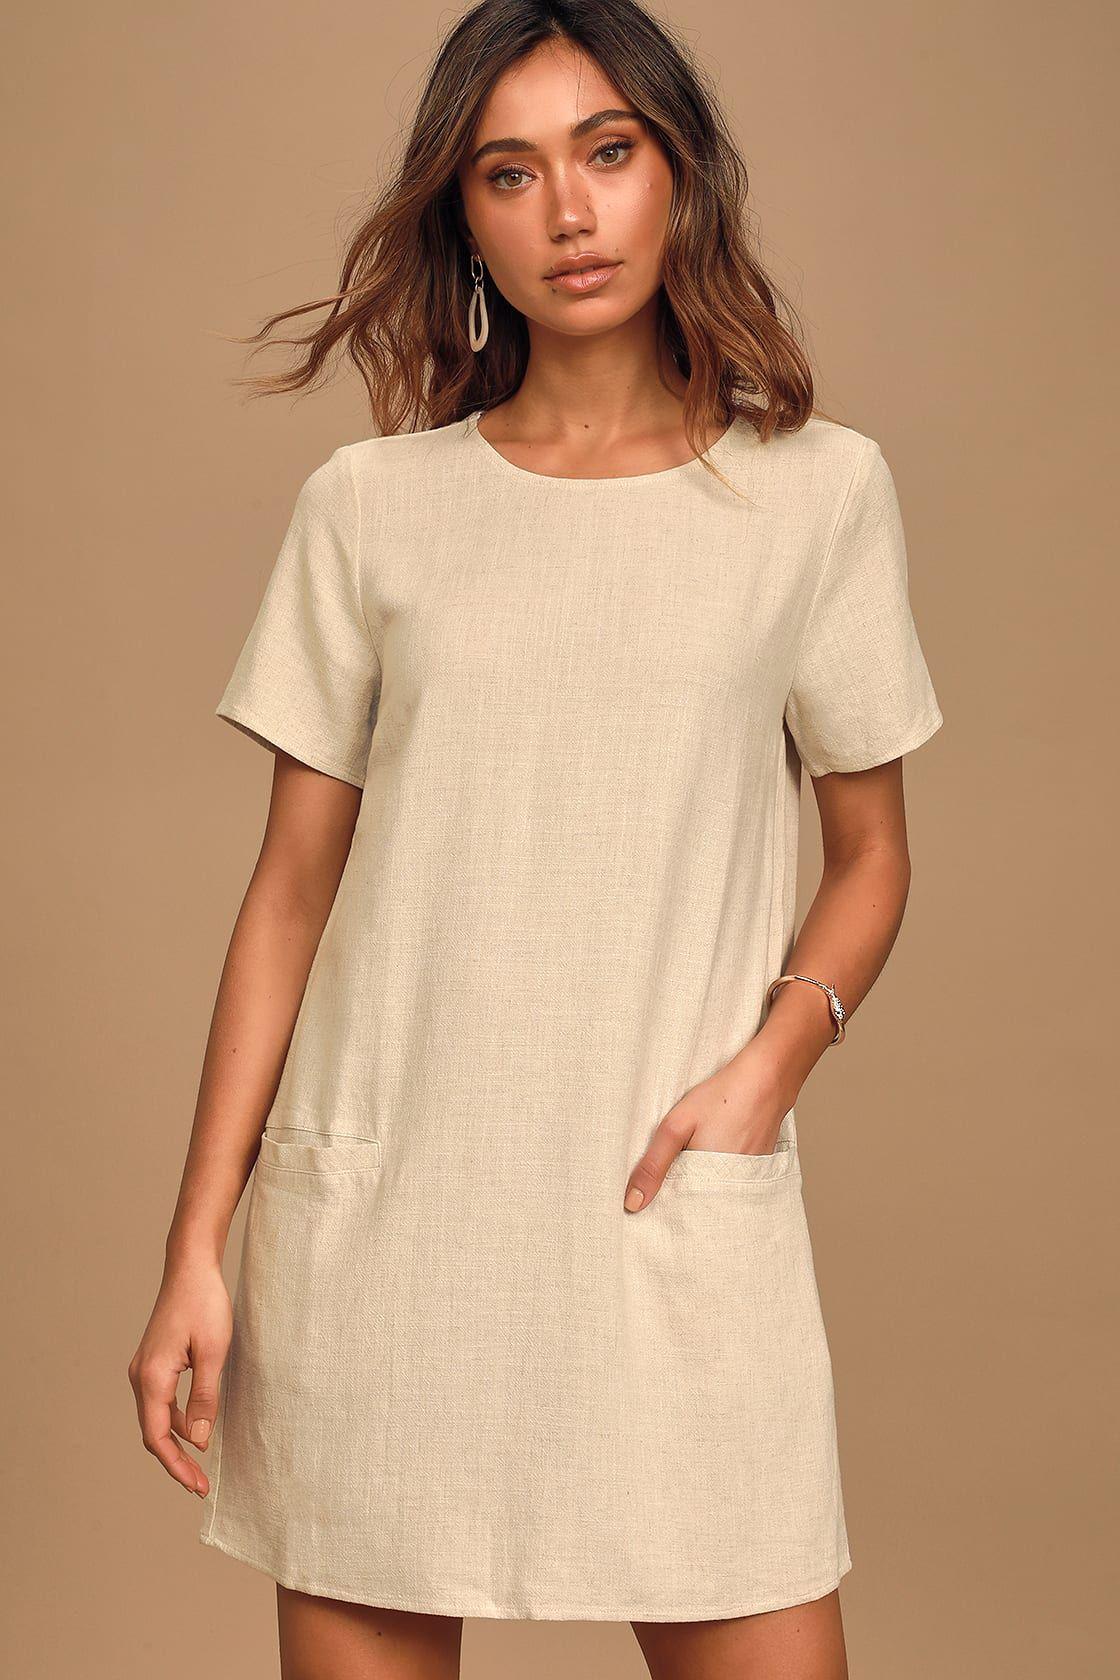 Simply Classic Beige Short Sleeve Shift Dress Short Sleeve Shift Dress Shift Dress Short Sleeve Mini Dress [ 1680 x 1120 Pixel ]